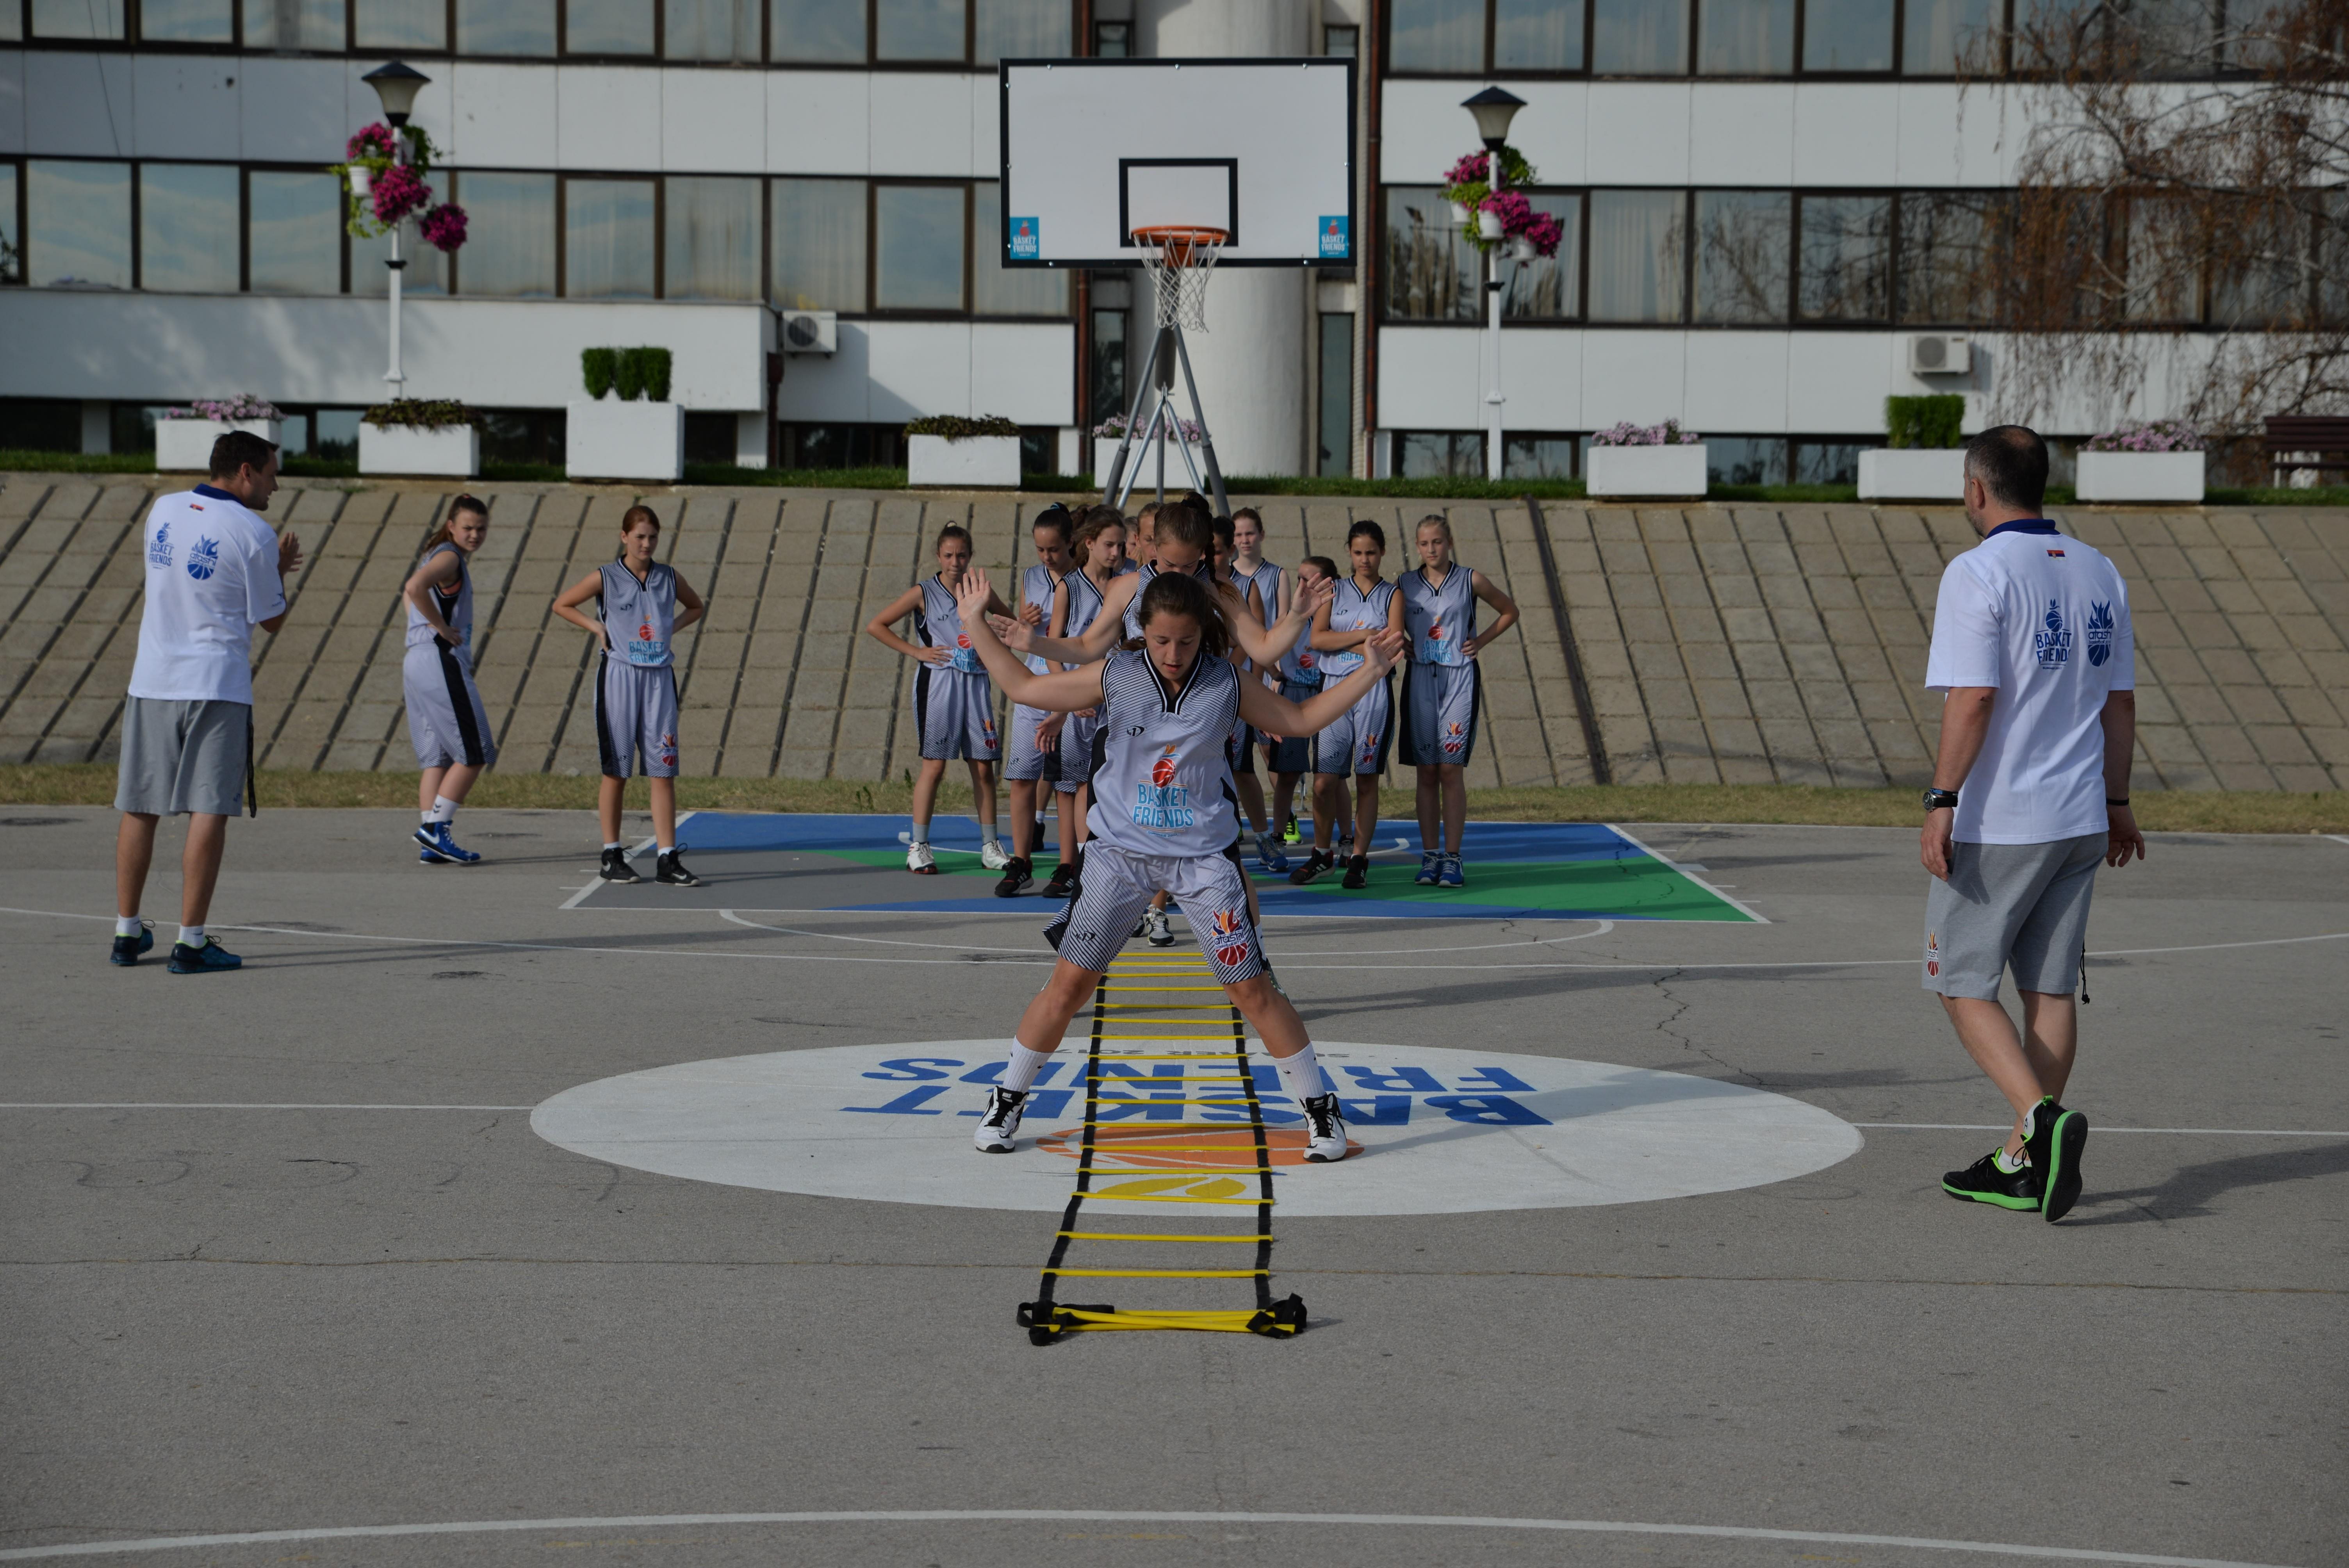 Basketfriends 2017. - trening koordinacije